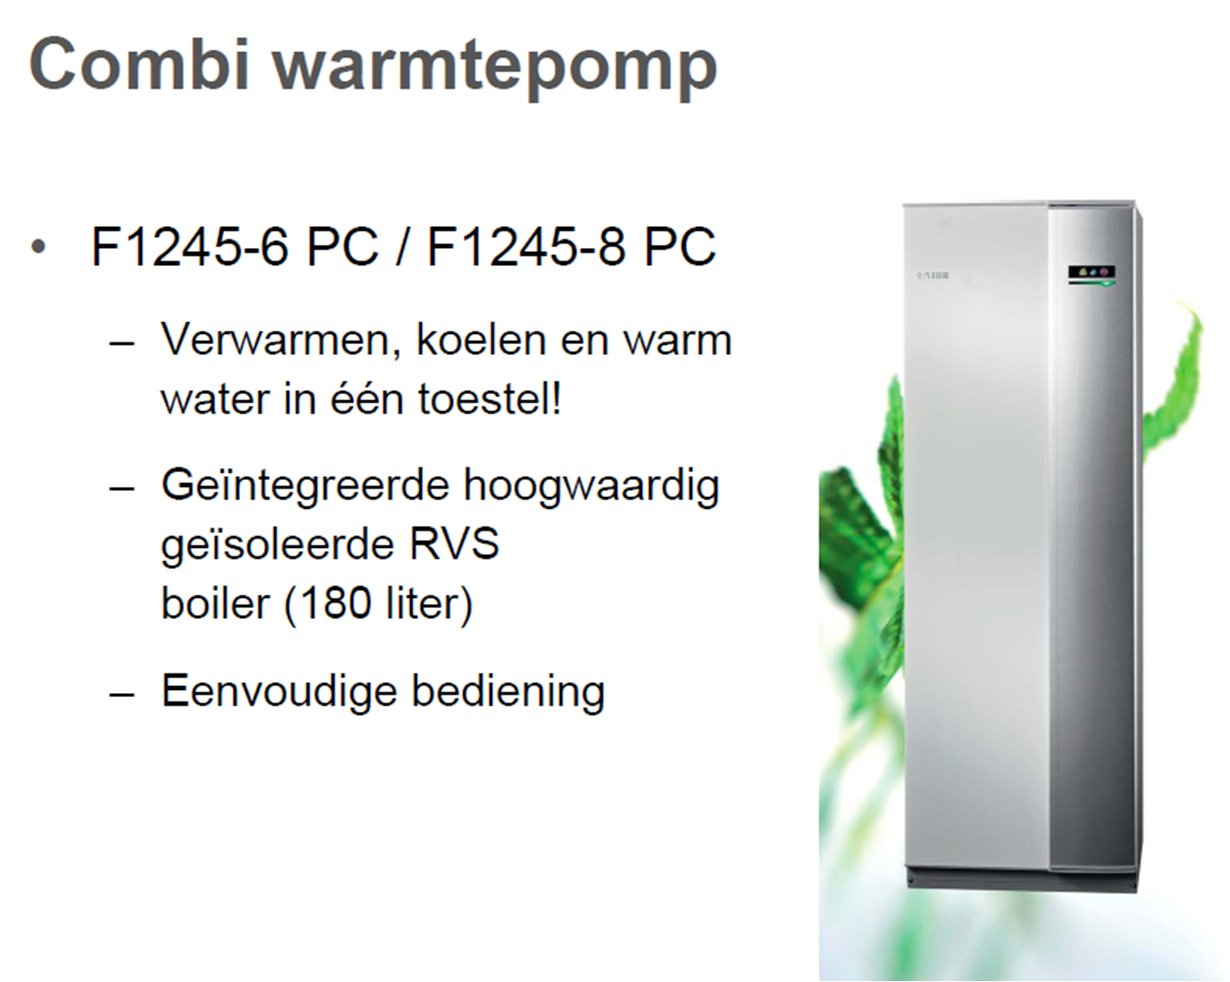 https://www.duurzaammbo.nl/images/Combiwarmtepomp.png